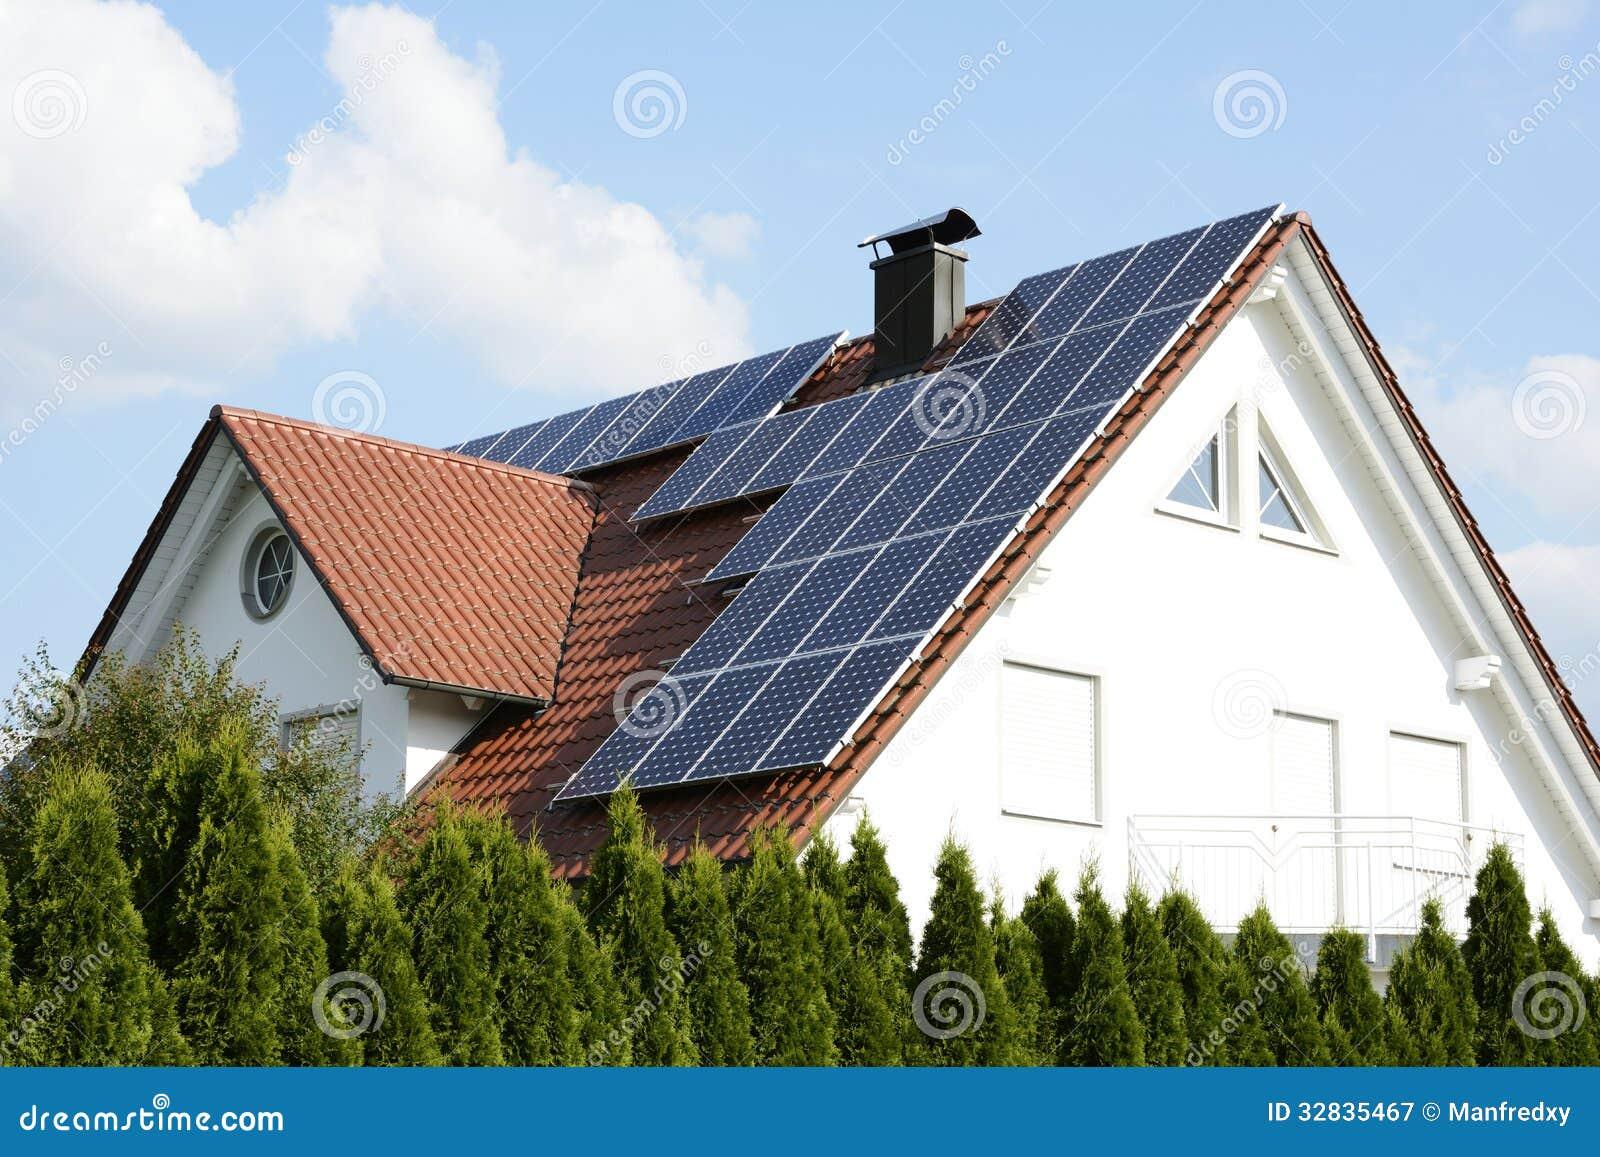 Renewable Energy Royalty Free Stock Photography Image